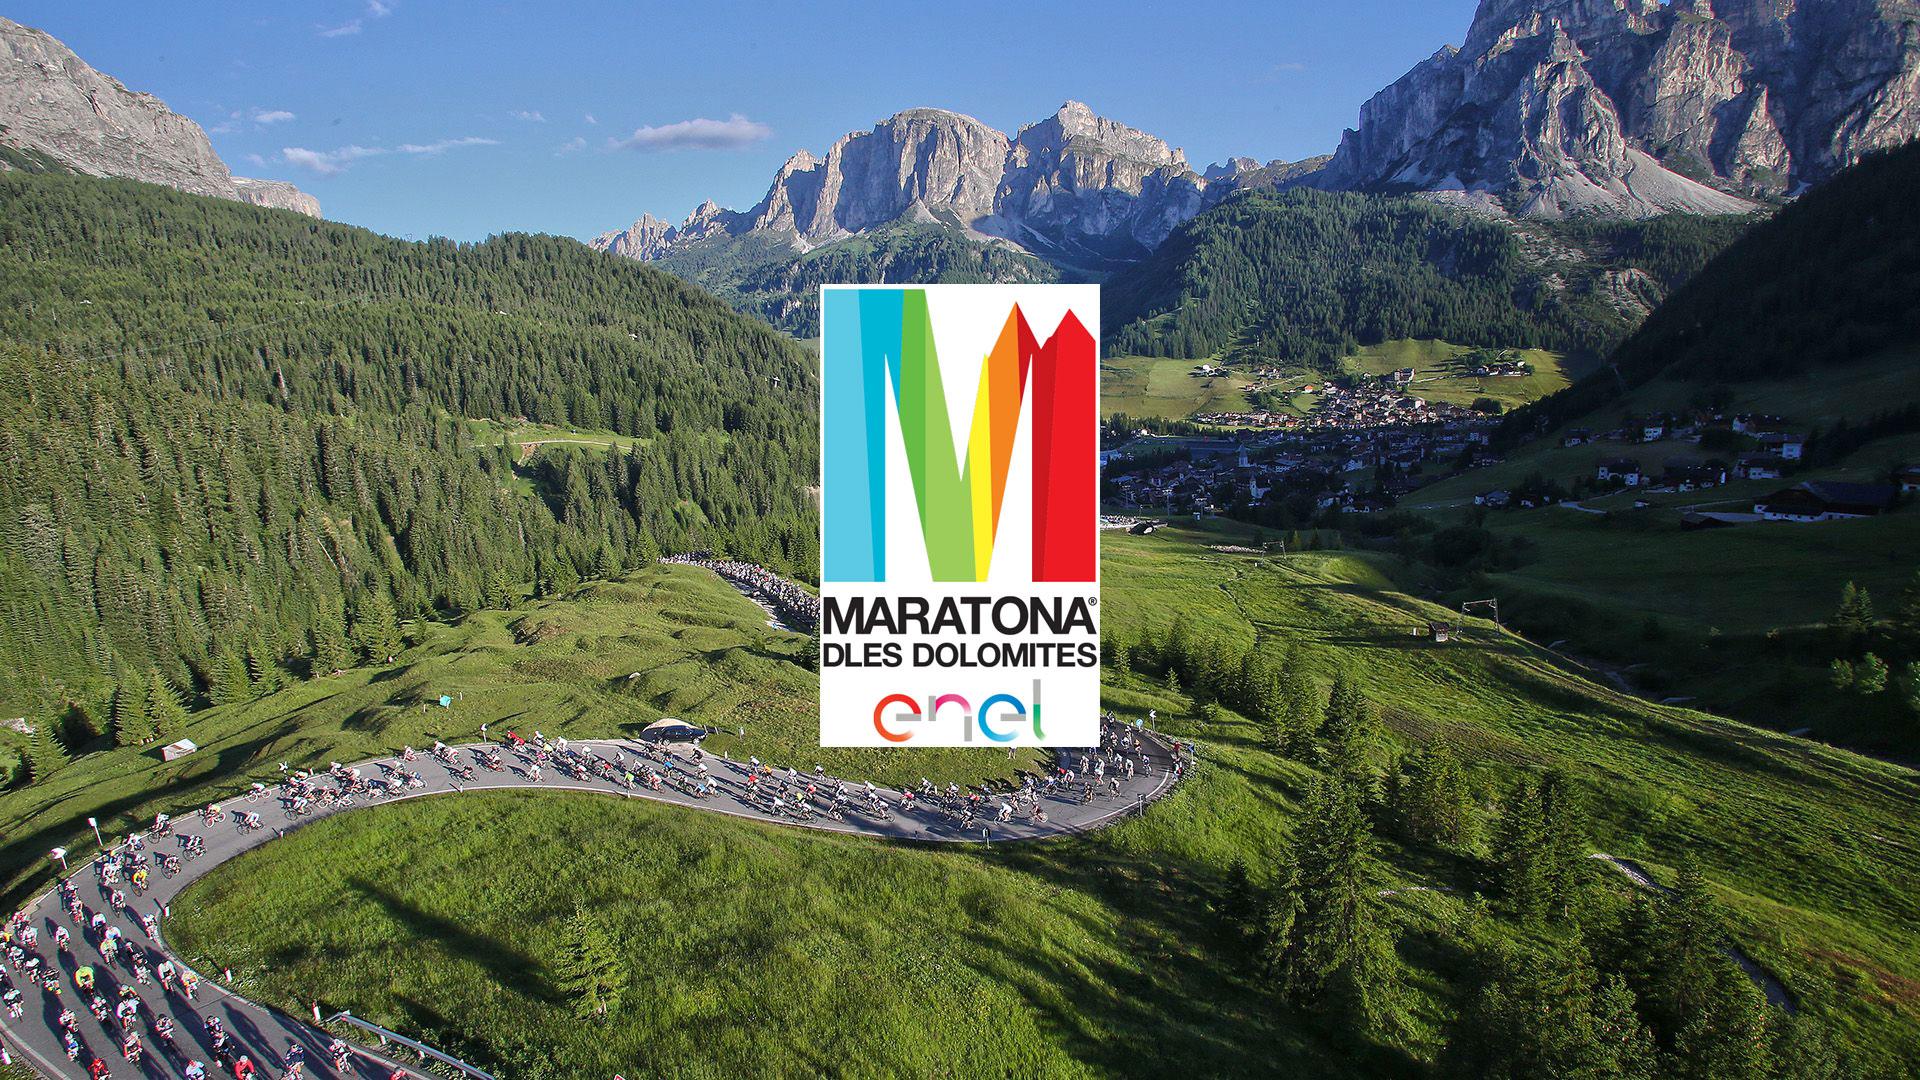 La Maratona delle Dolomiti: 9.000 partecipanti al via!